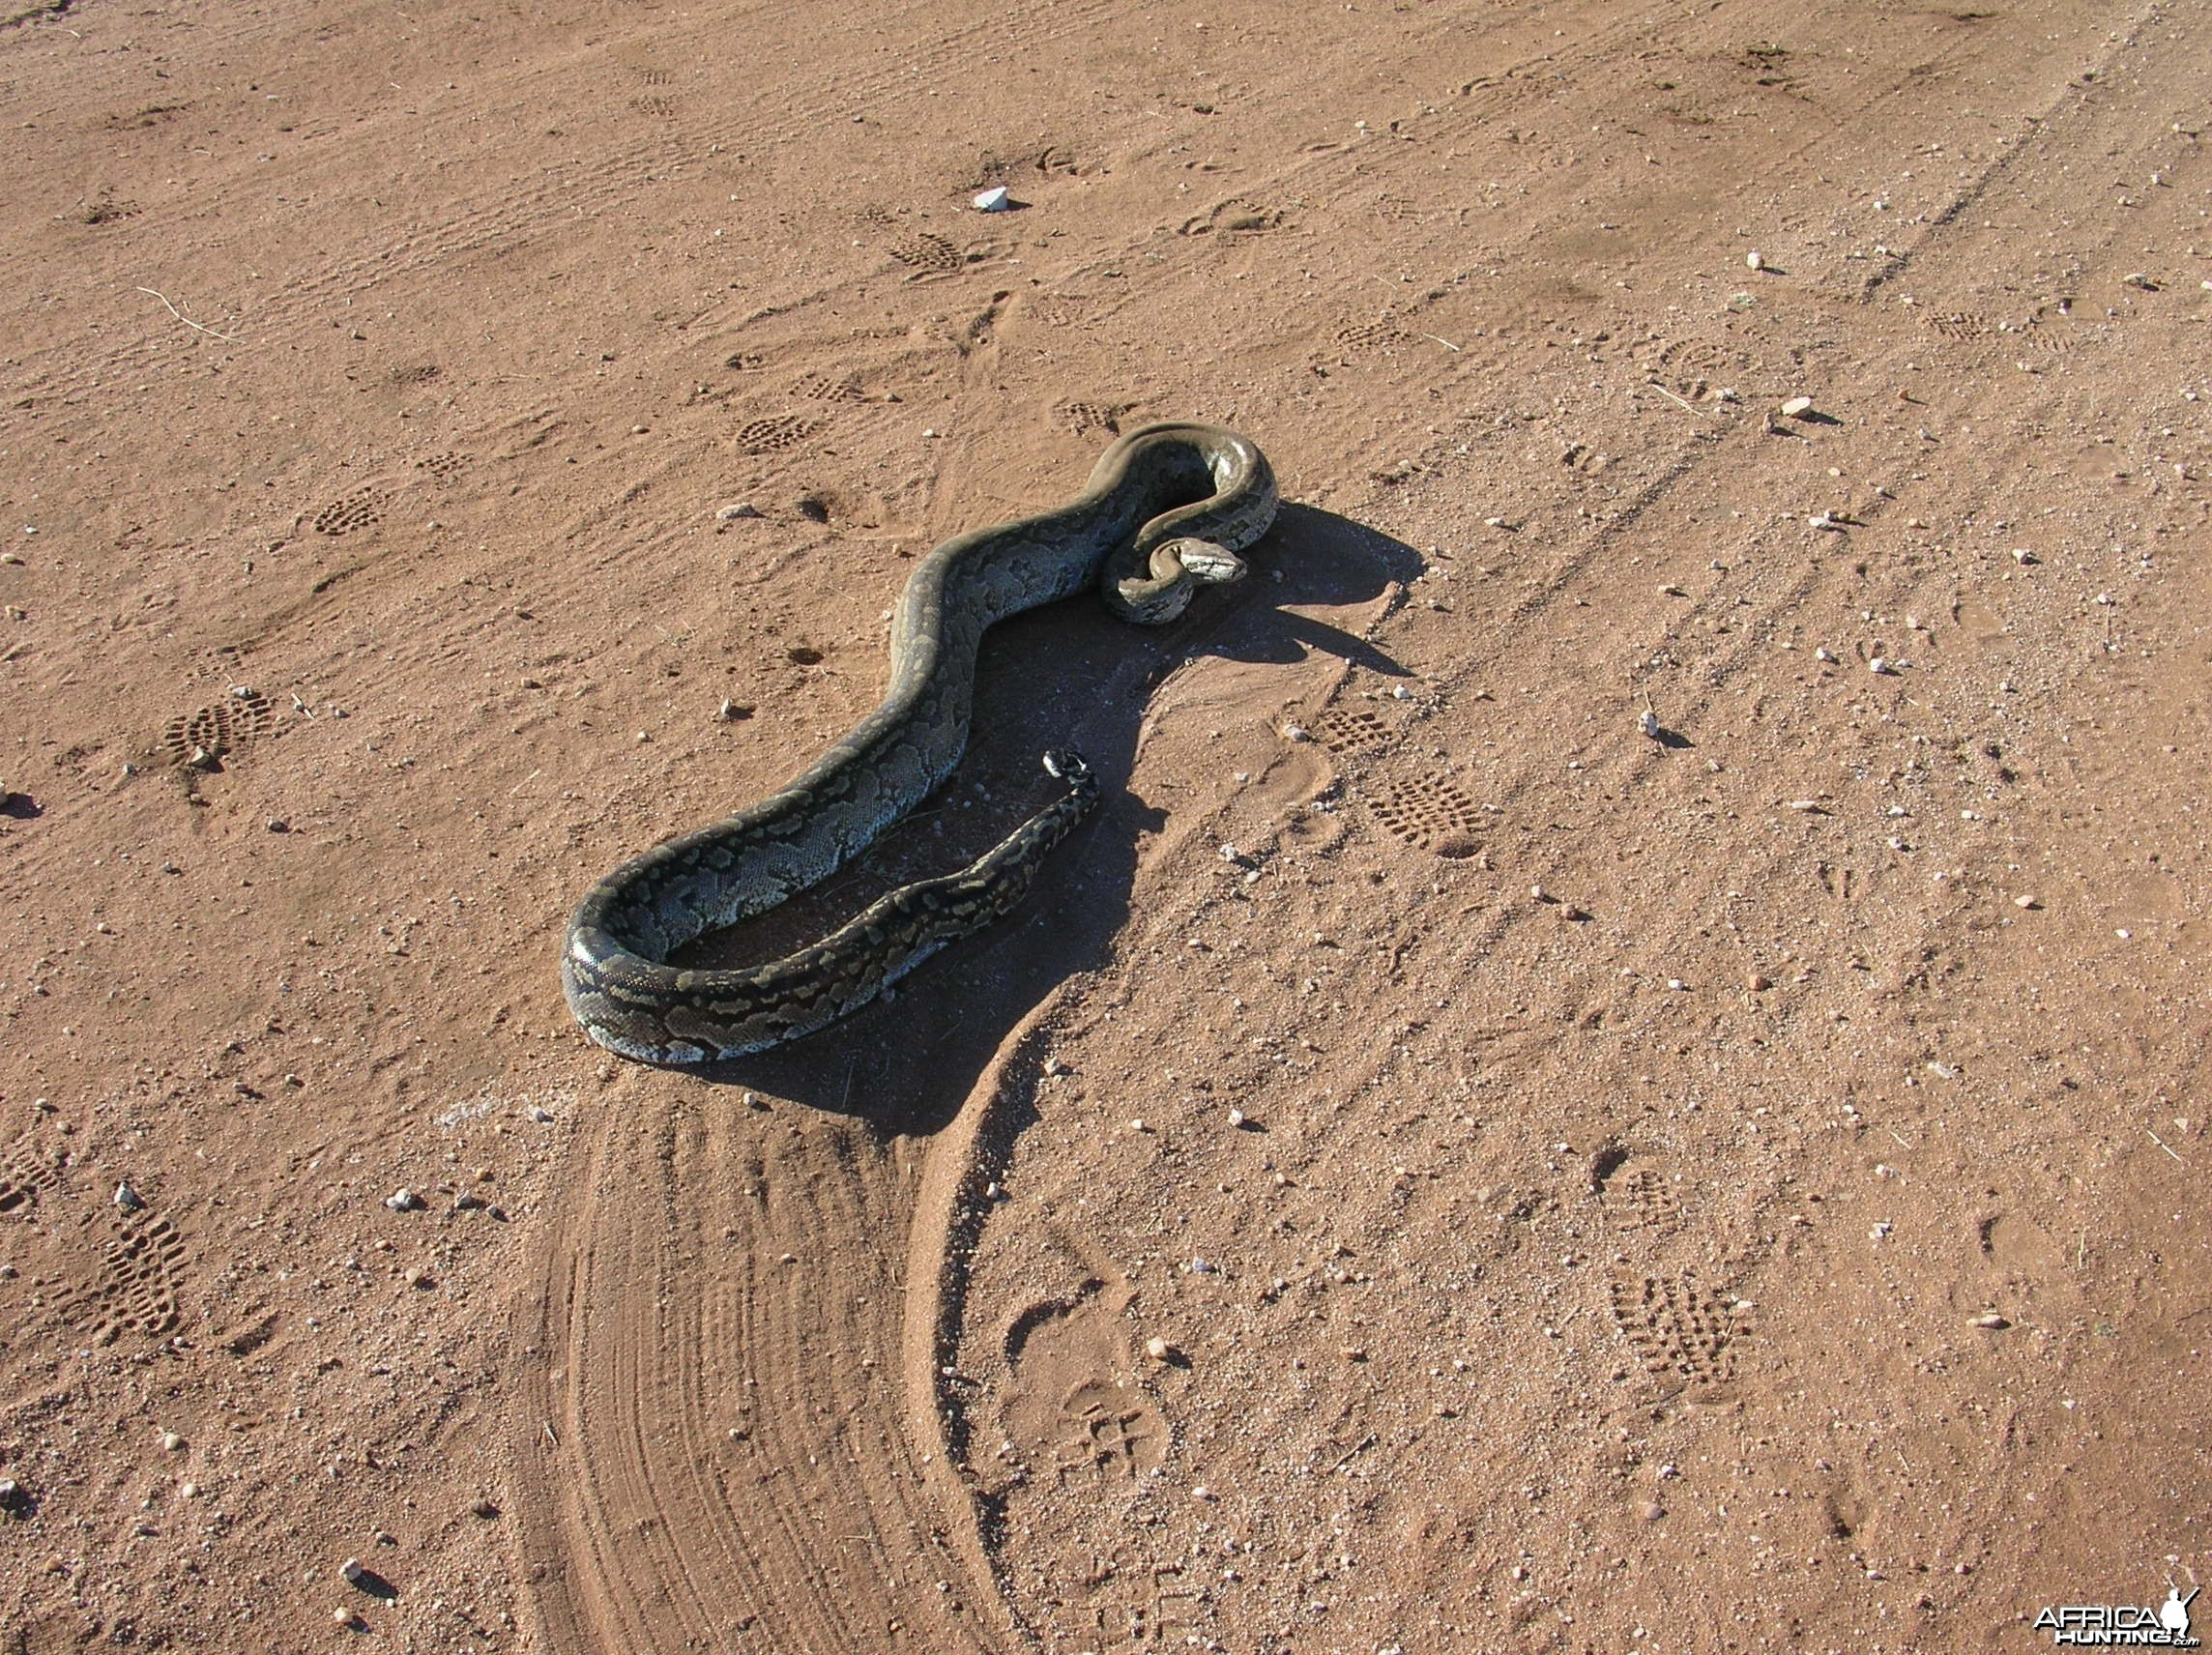 Python in Namibia